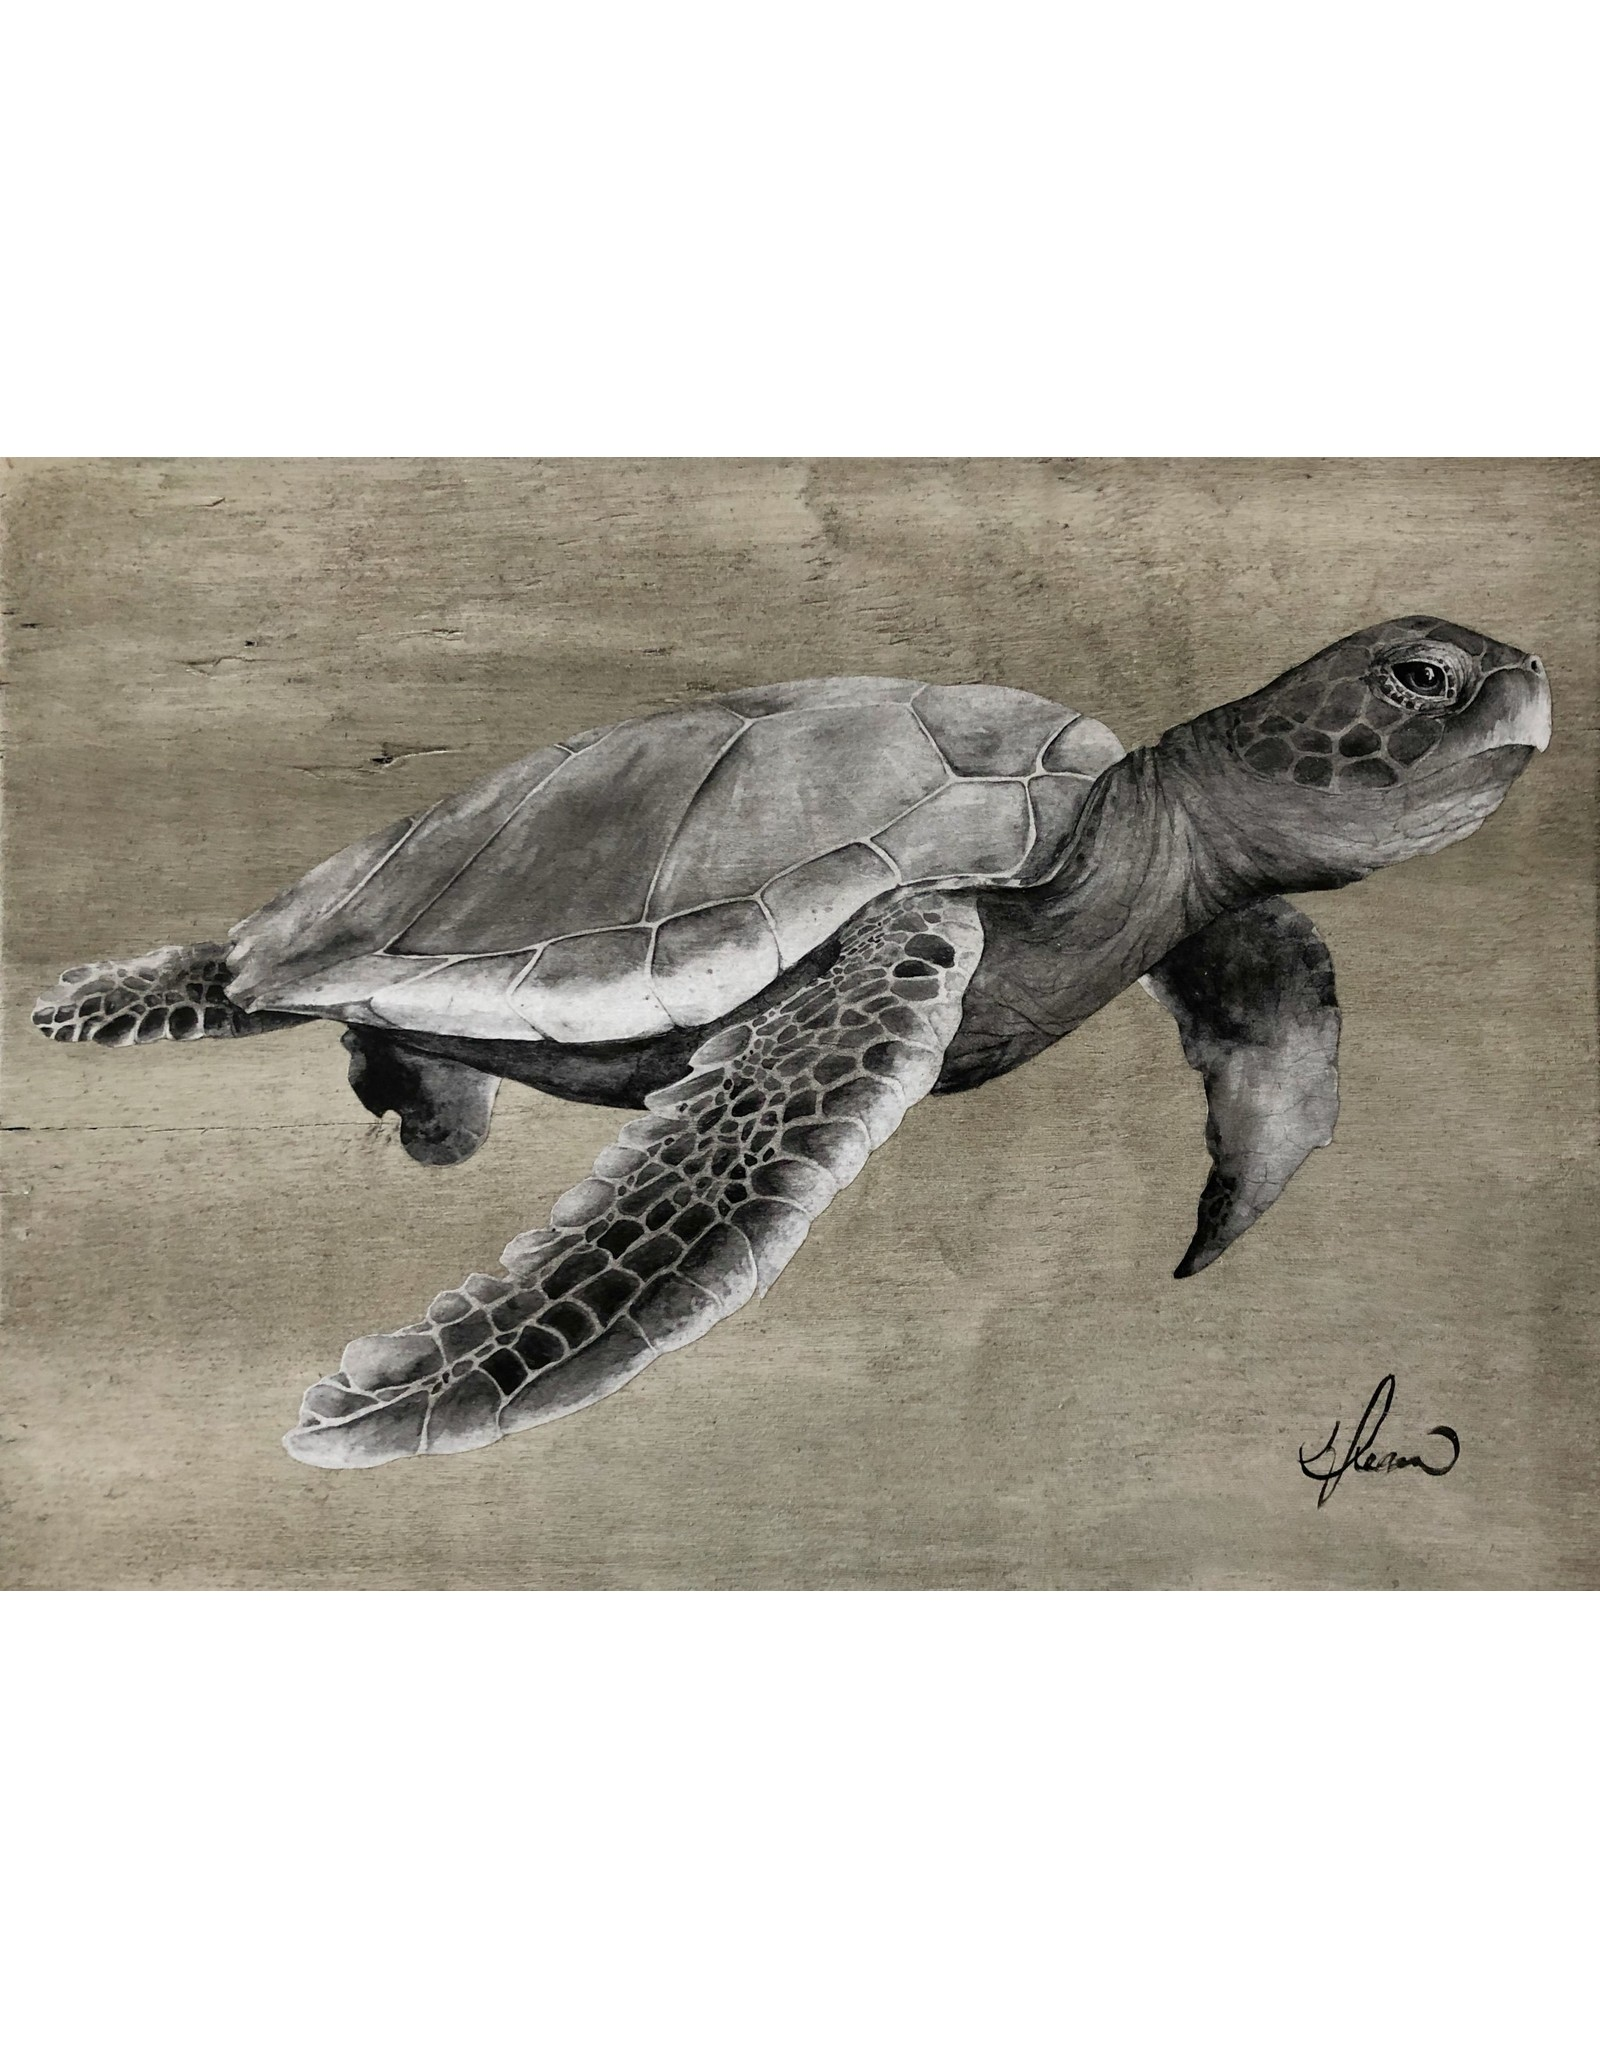 "Molly Pearce Loggerhead Turtle 17x24"""" MOLP)"